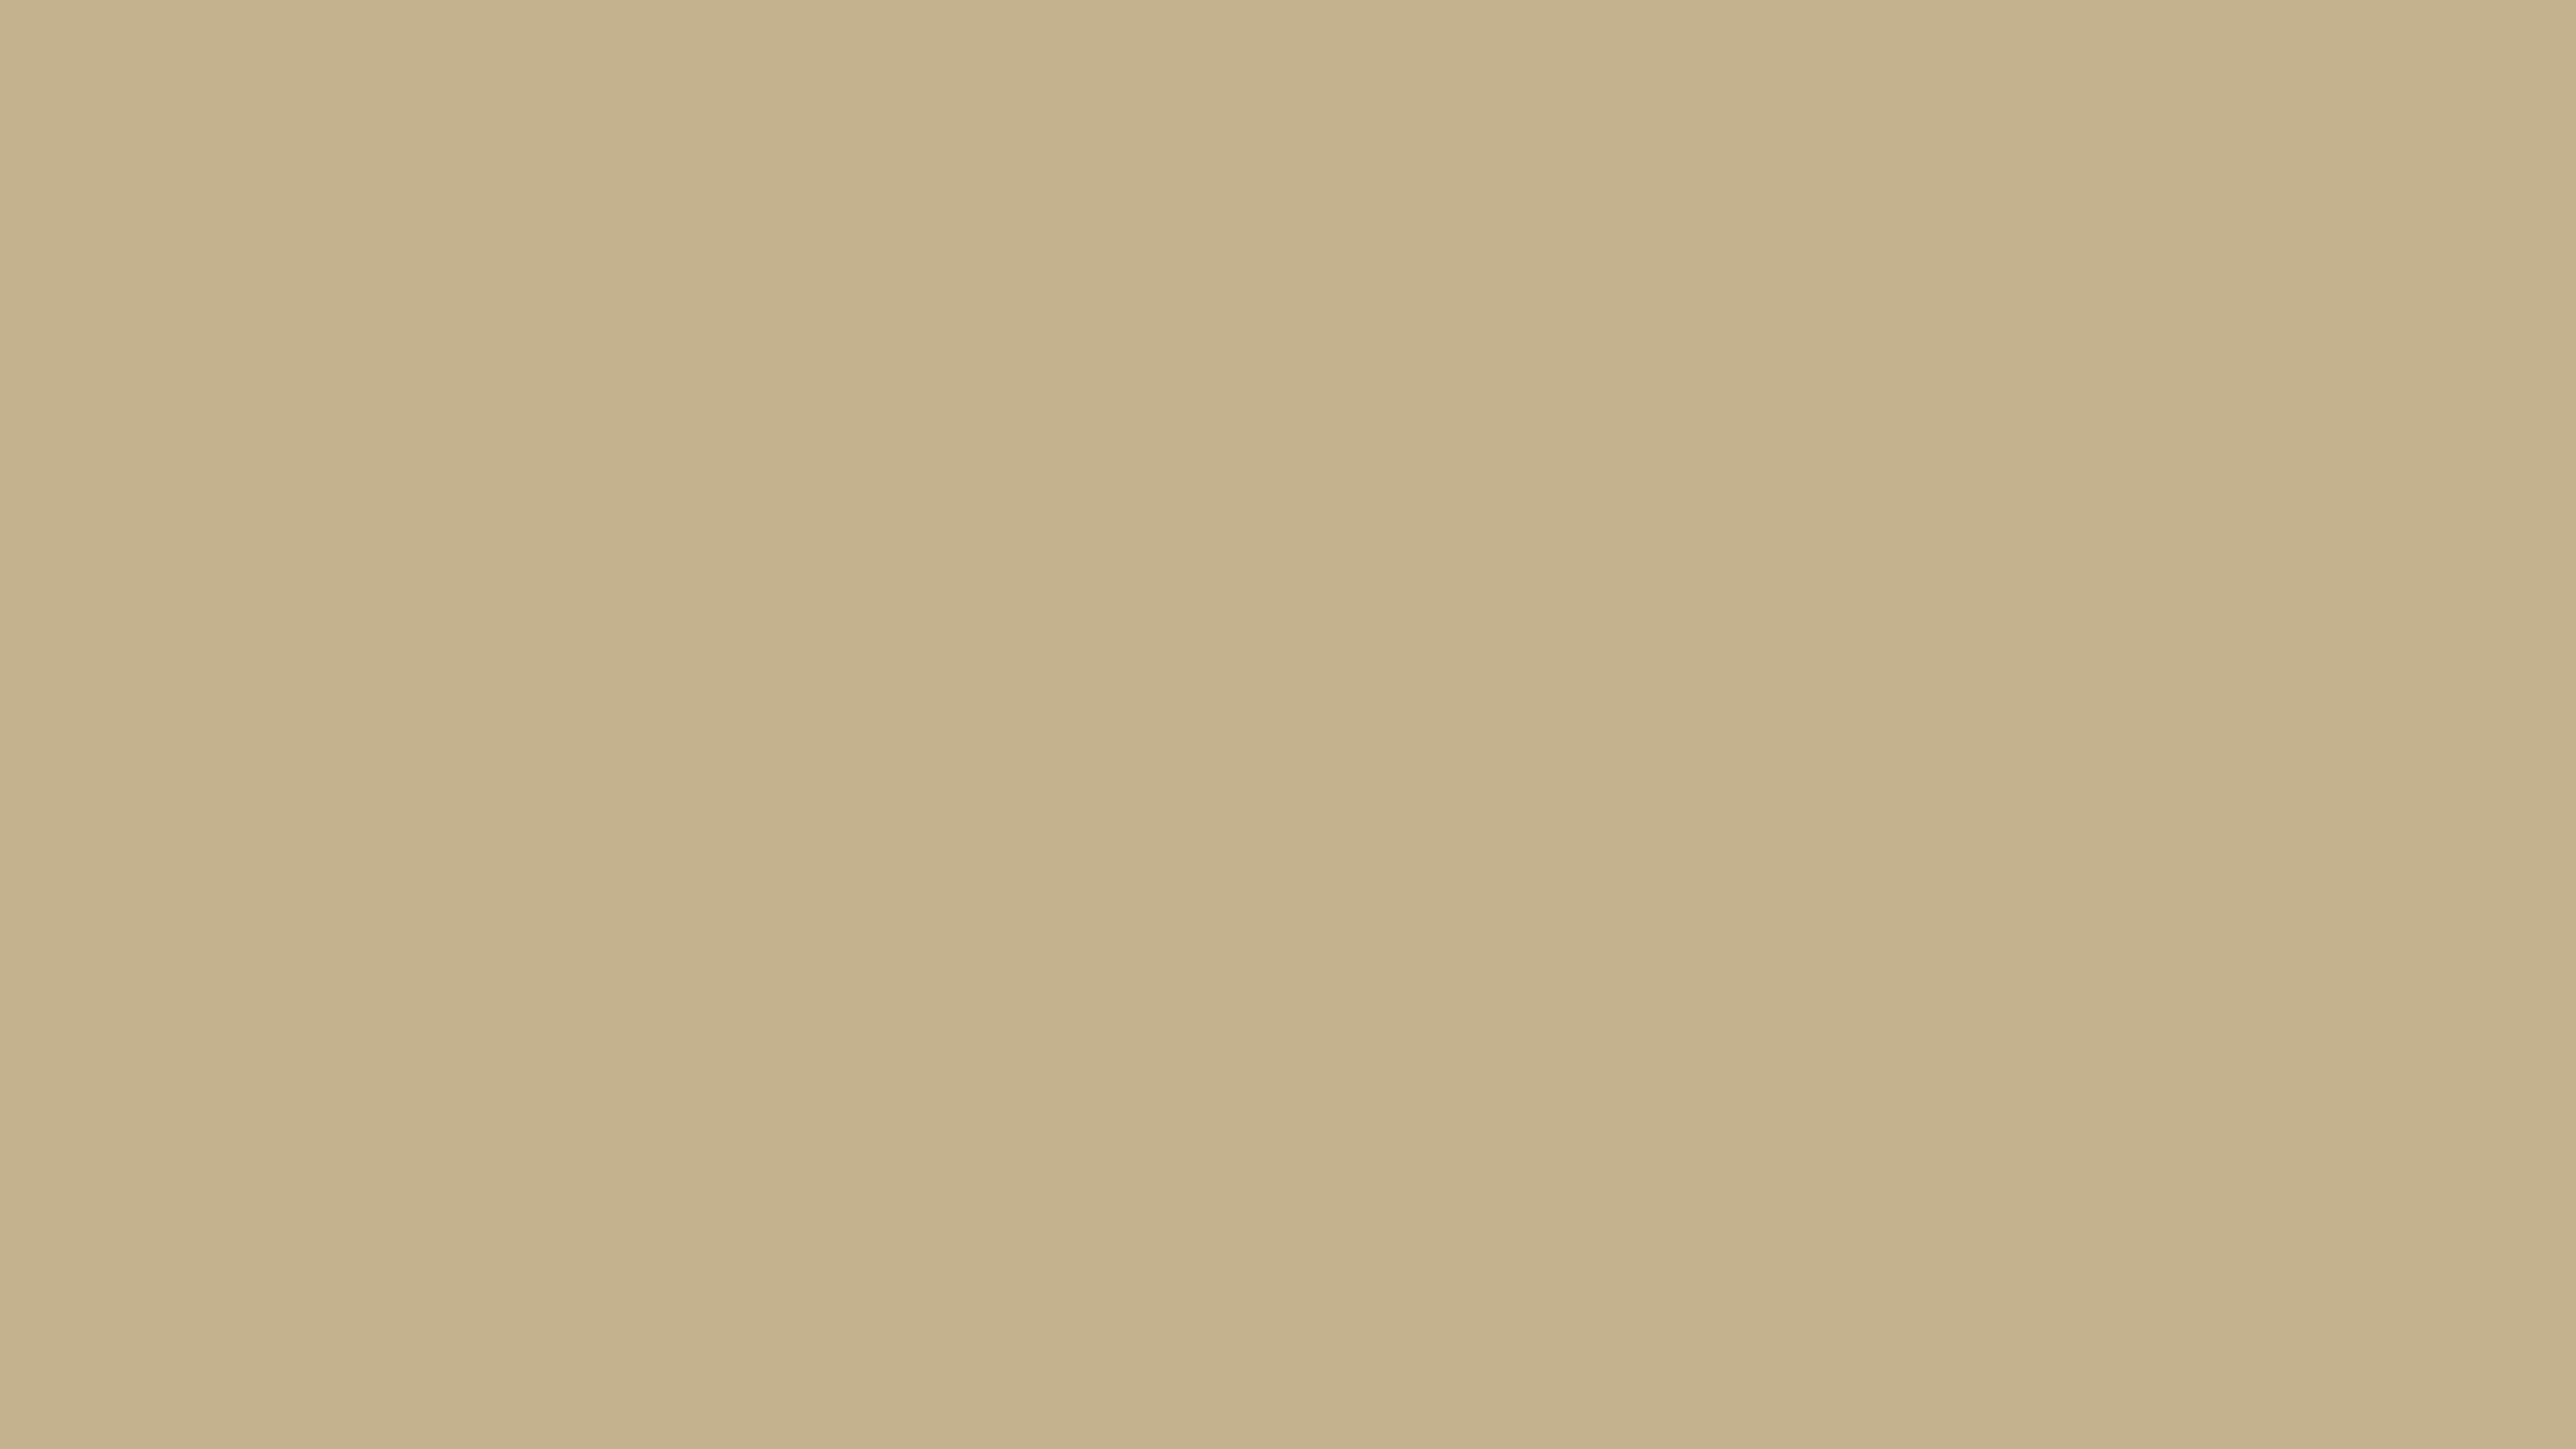 5120x2880 Khaki Web Solid Color Background